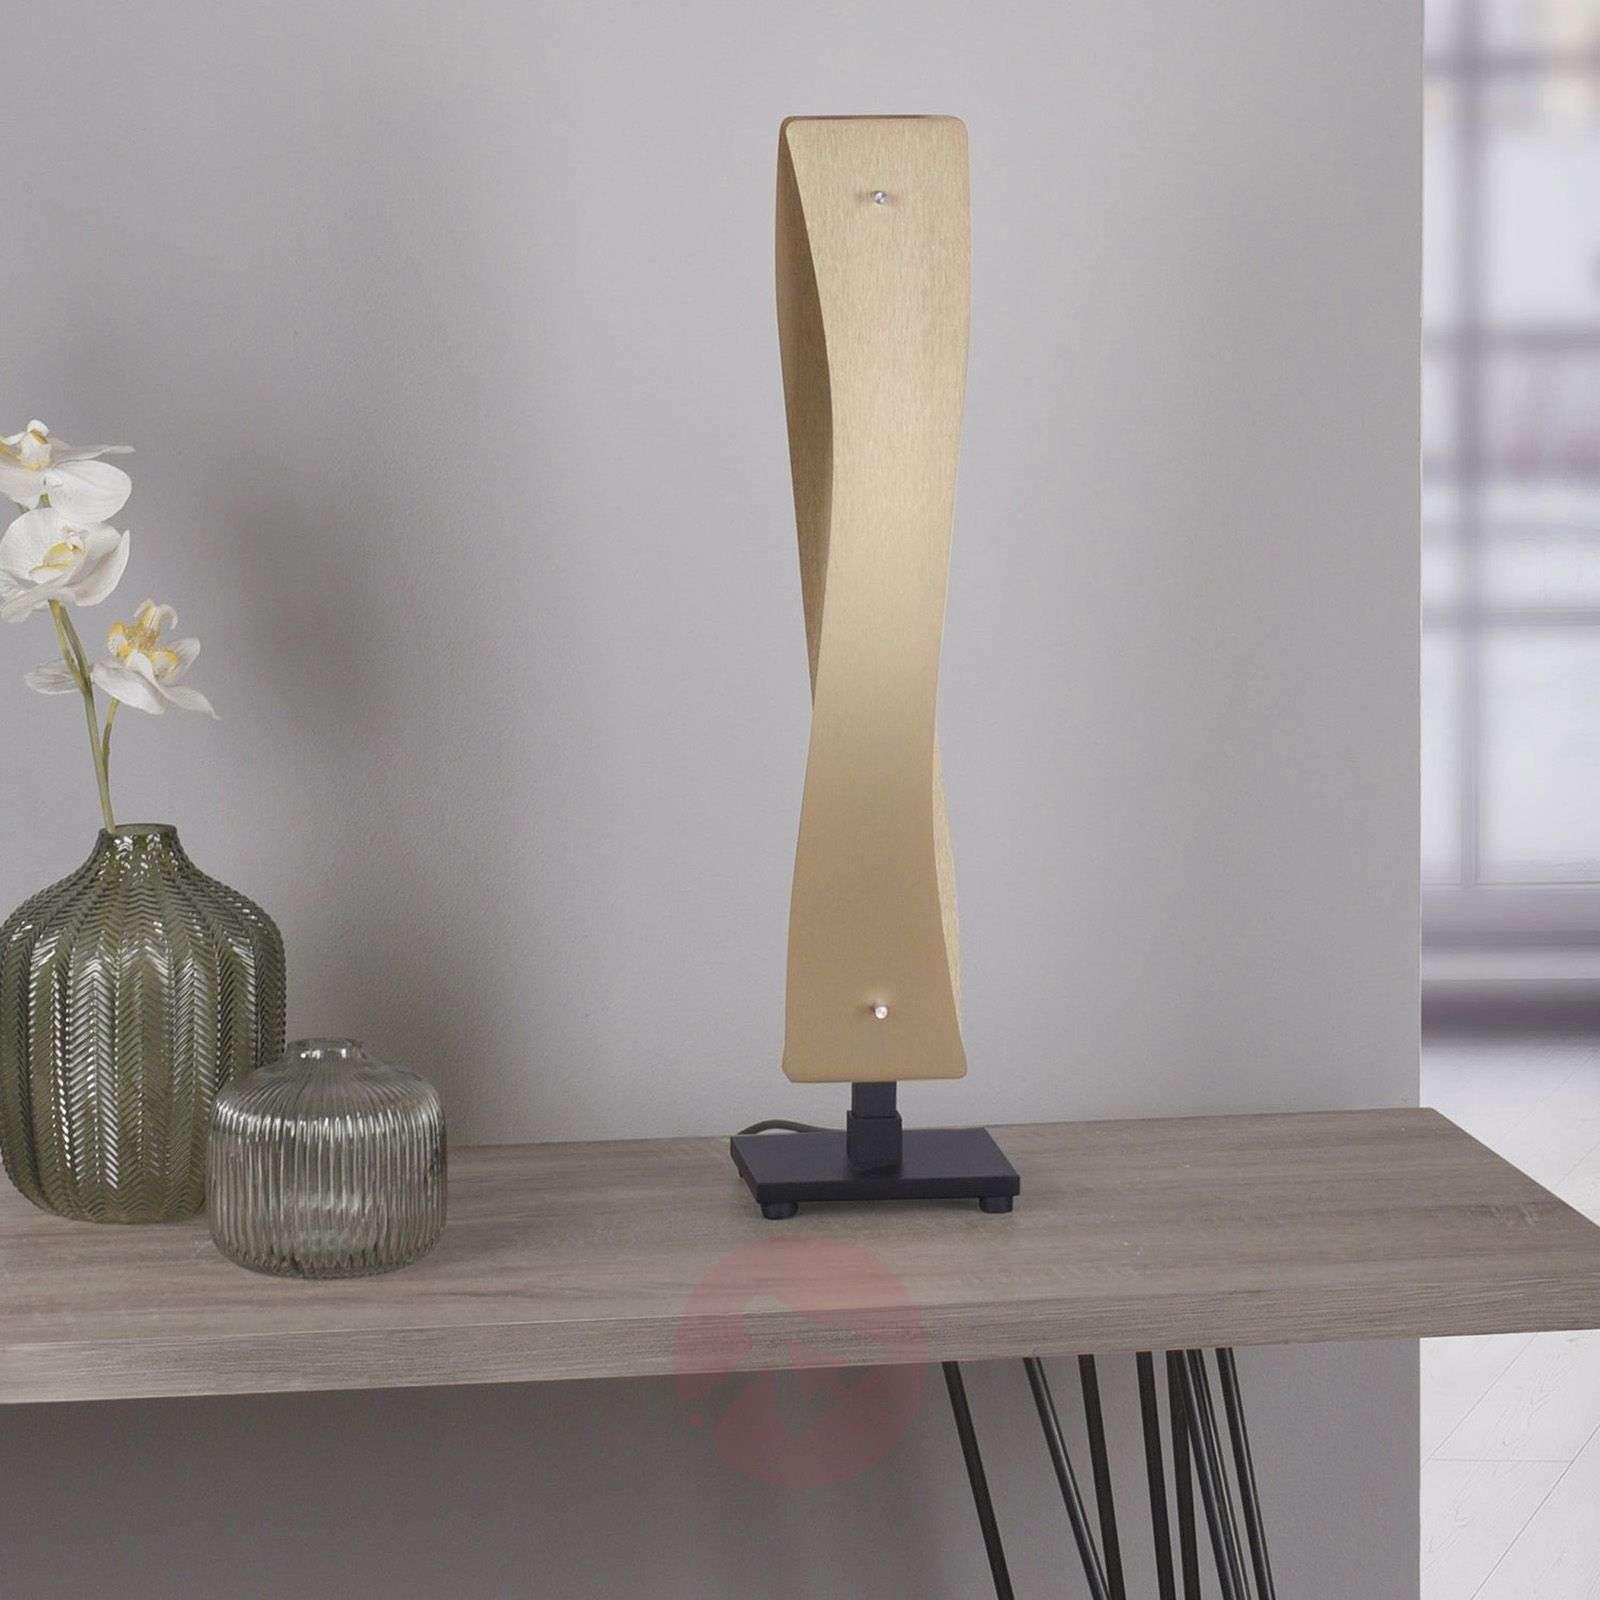 Lucande Lian LED-pöytävalaisin messinki, musta